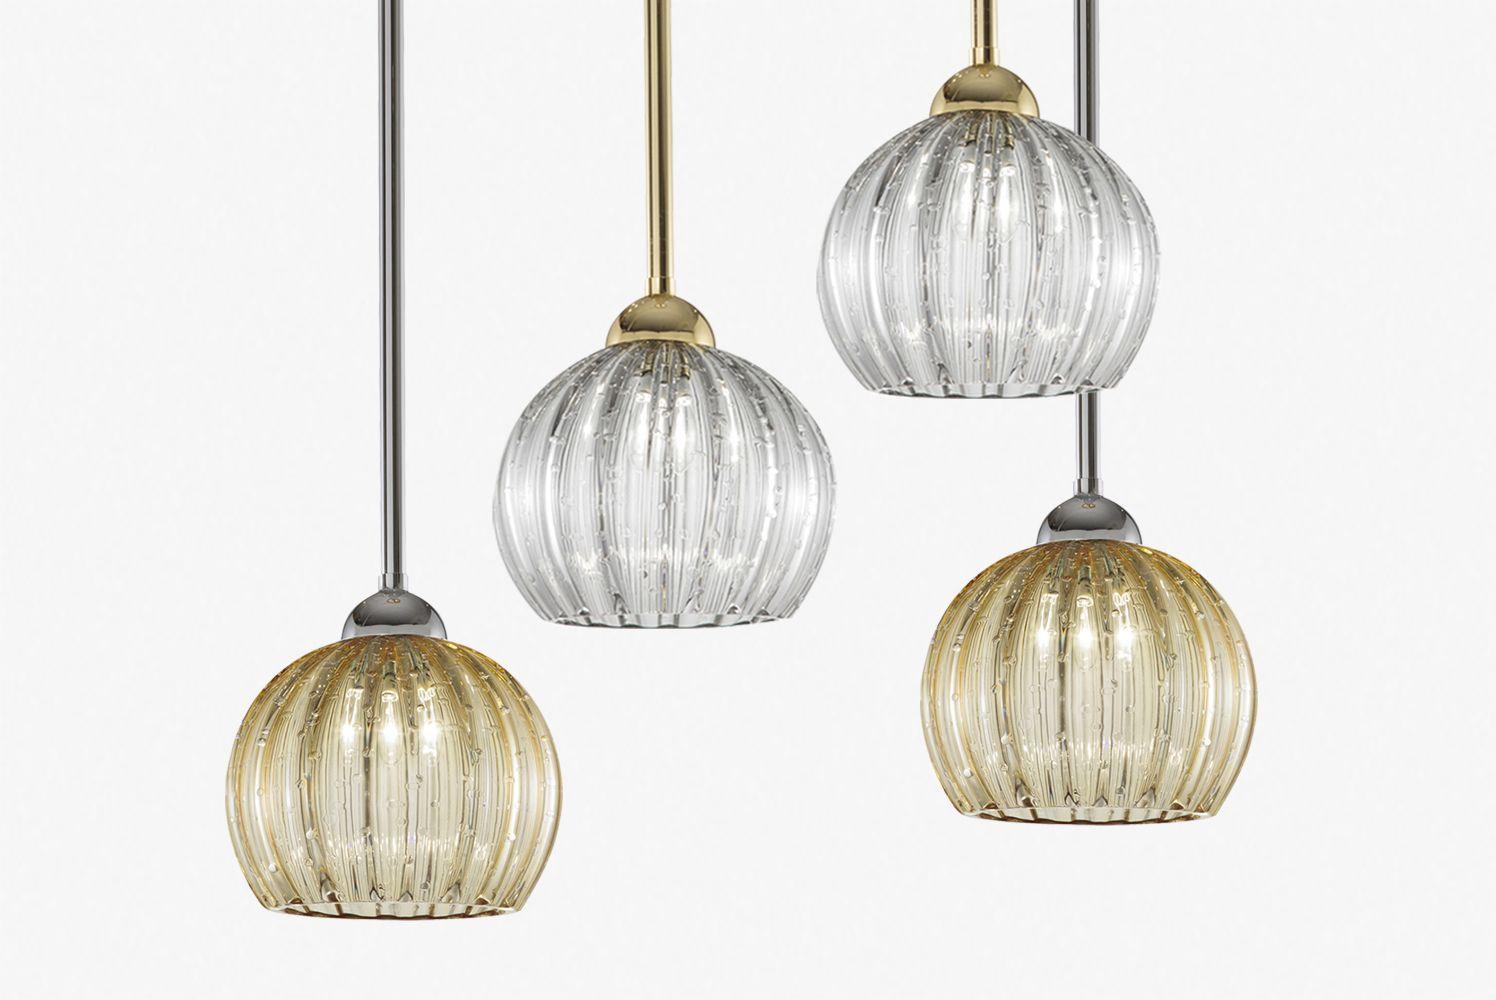 Clara pendants baroncelli ffe ii decorative lights pinterest clara pendants baroncelli arubaitofo Images